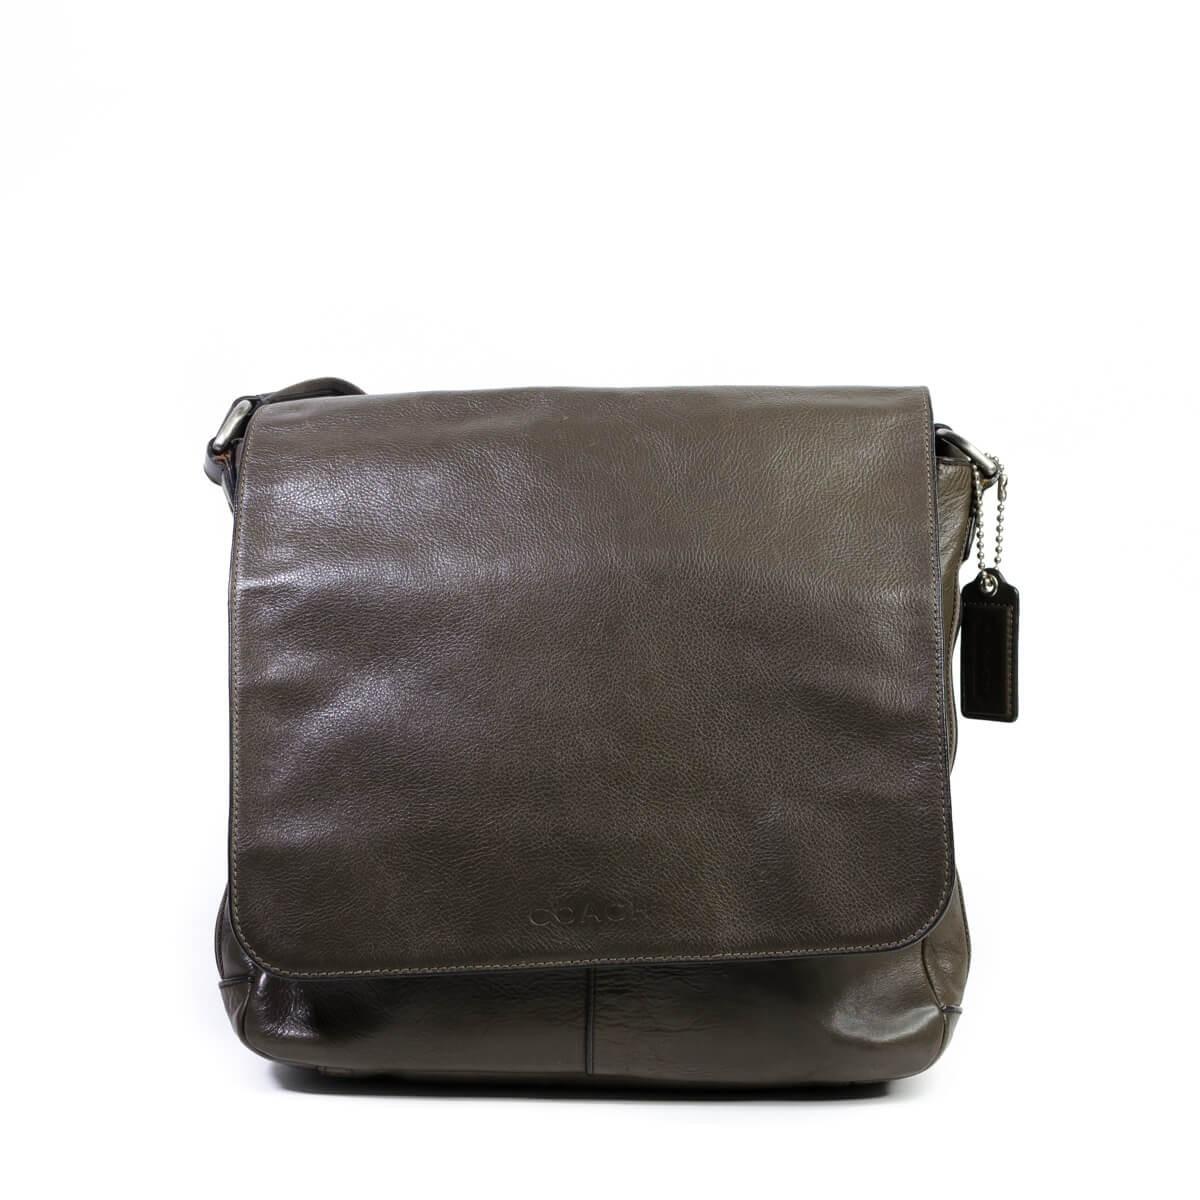 Heritage Web Map Crossbody Travel Men s Luggage Khaki Black Leather Messenger  Bag 493d95eec105d